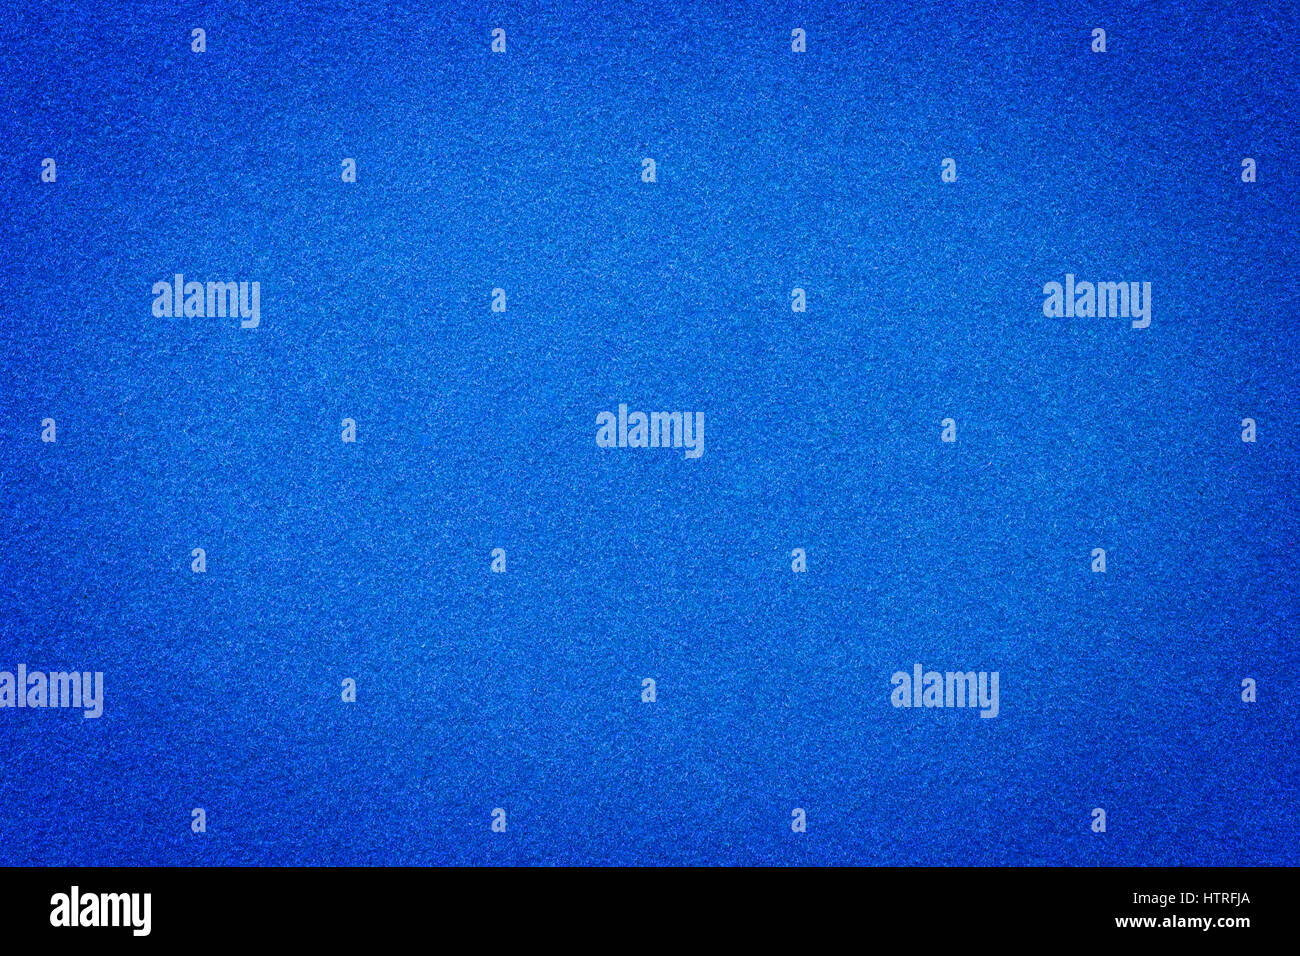 Blue Velvet Textured Paper Close Up Light Center For Copy Space Stock Photo Alamy